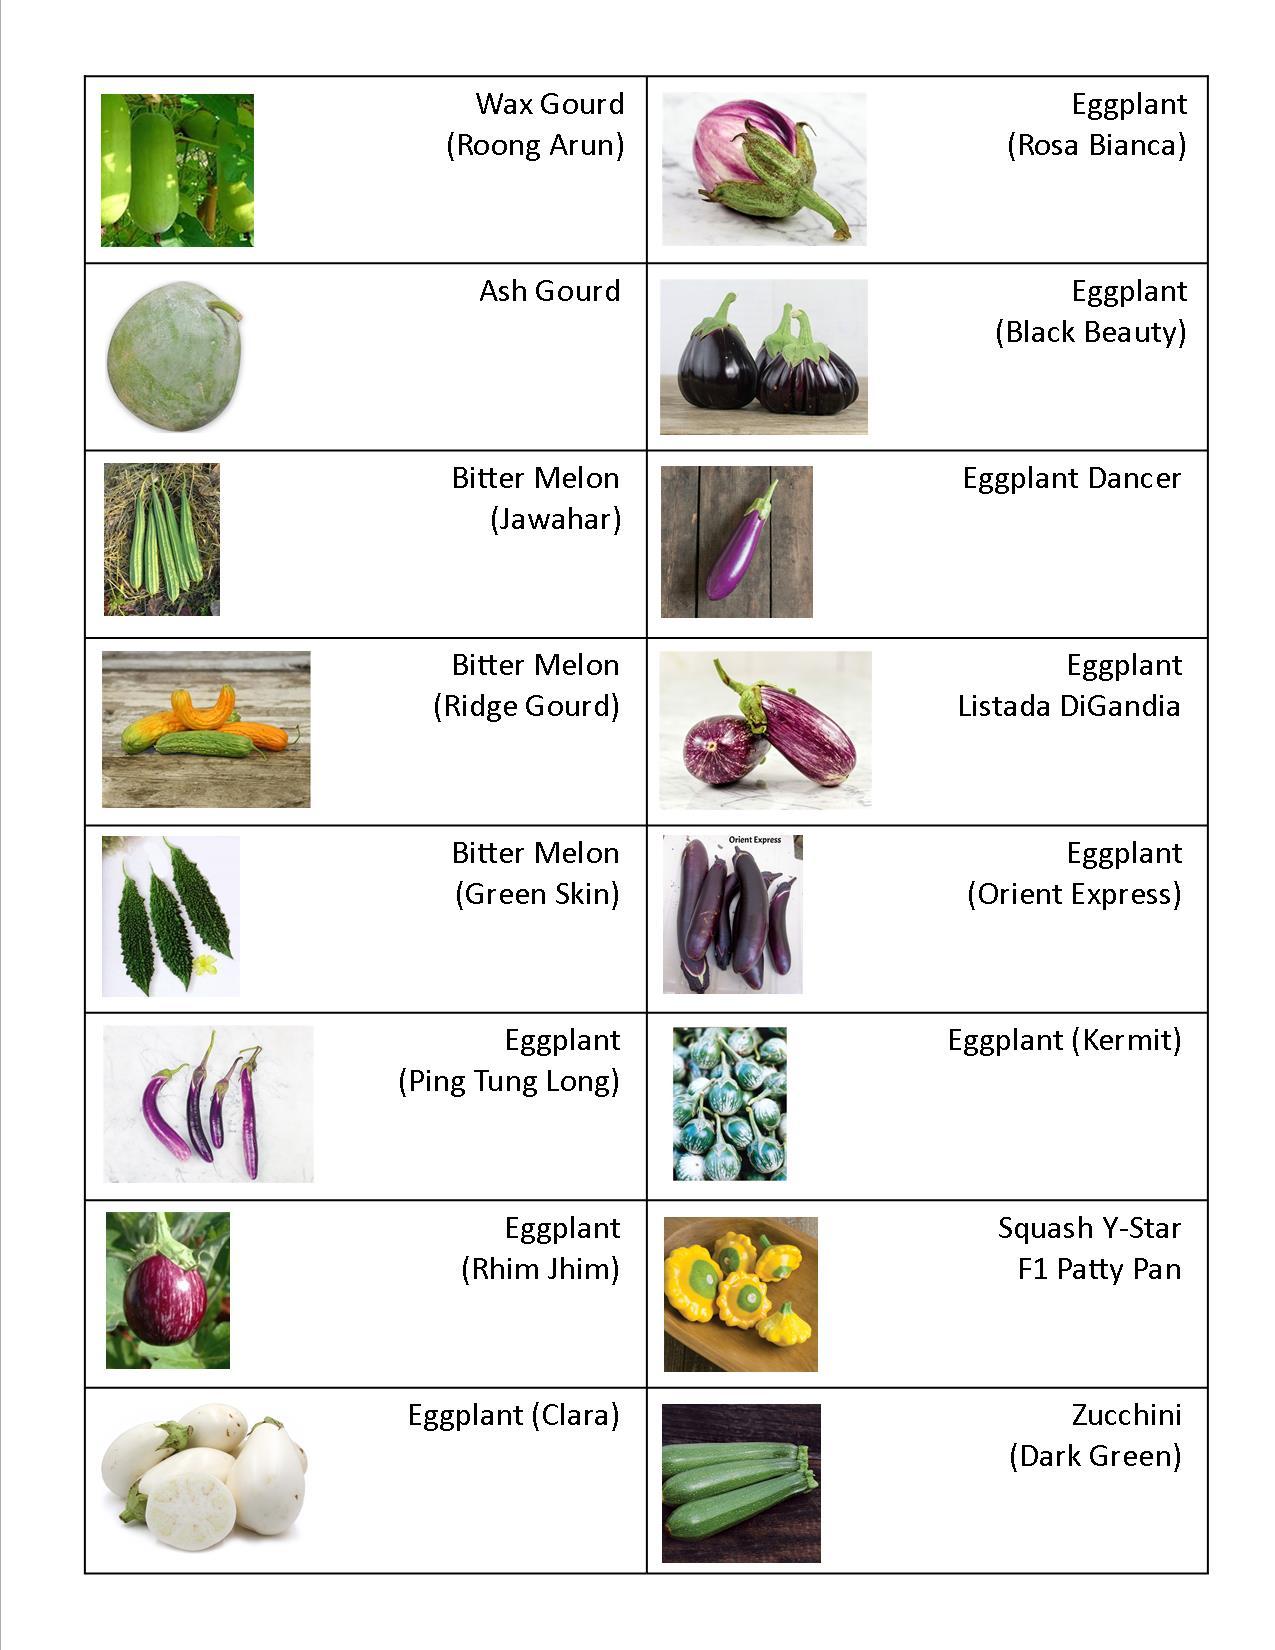 Gourd, Eggplants, Squash